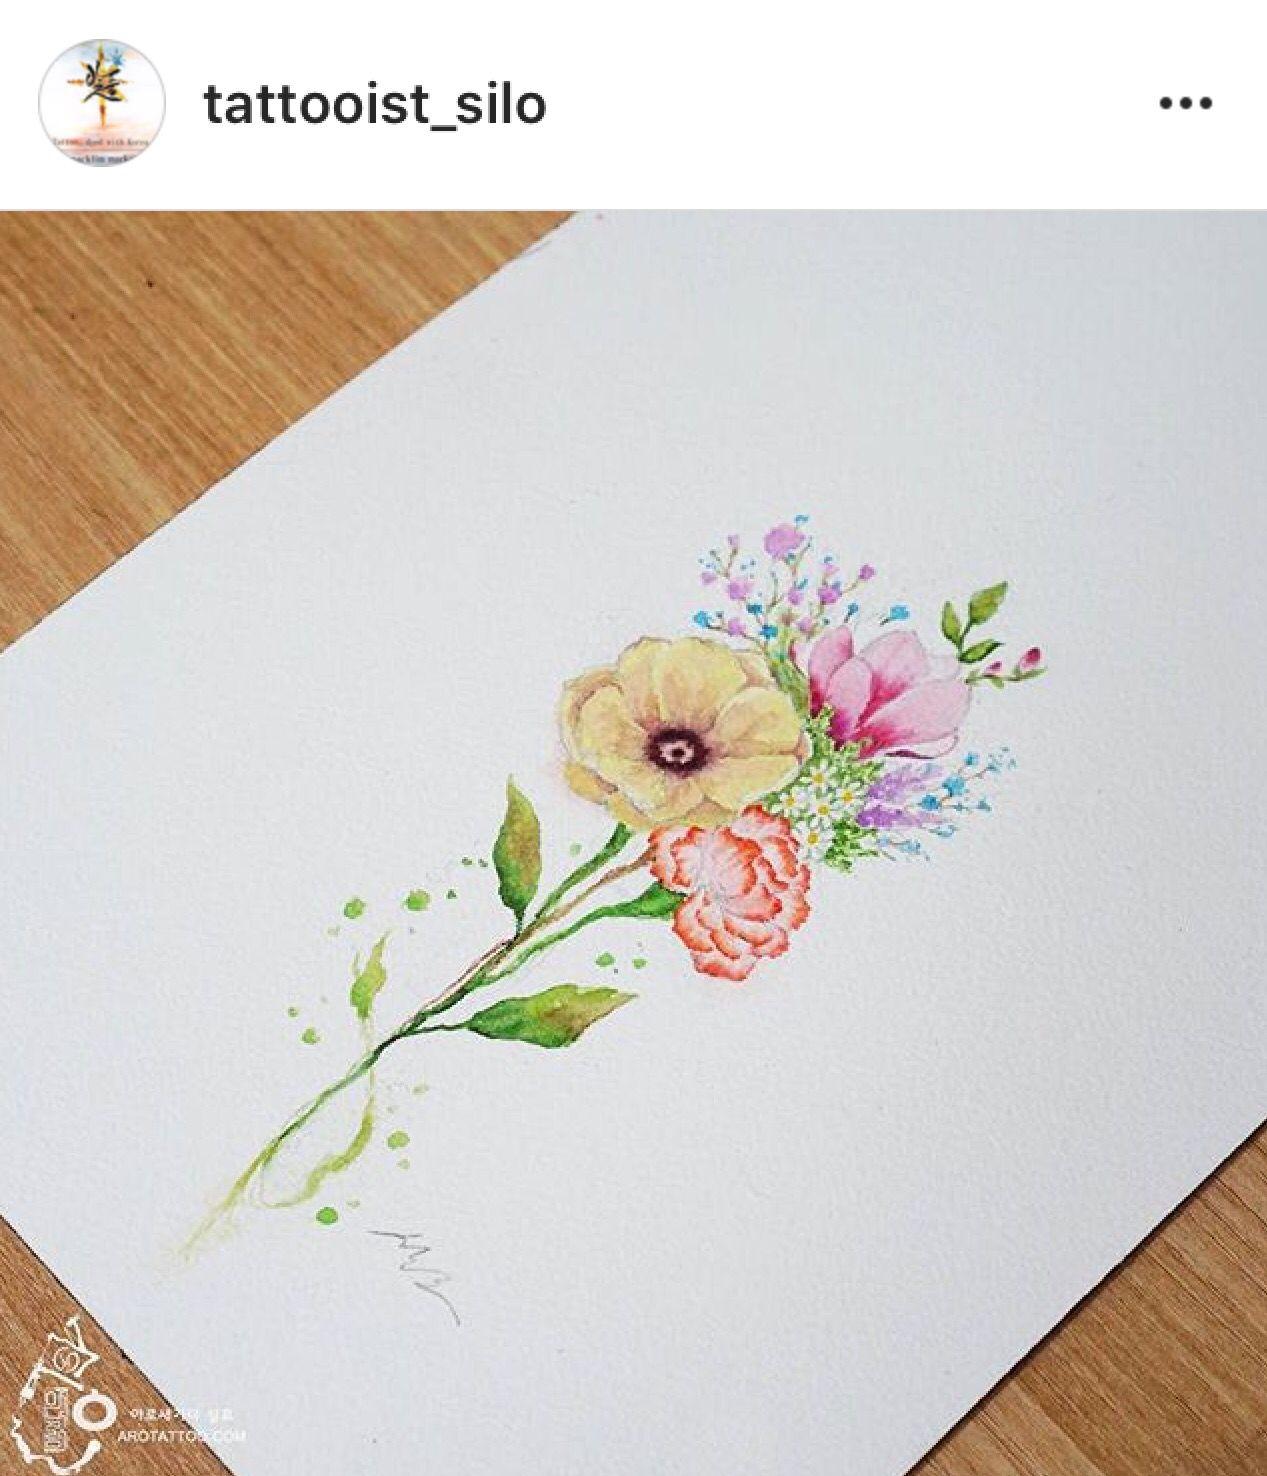 Silo Tattoos Incredible Body Art Masterpieces That Look: Tattooist_Silo On Instagram Great Tattoo Idea.